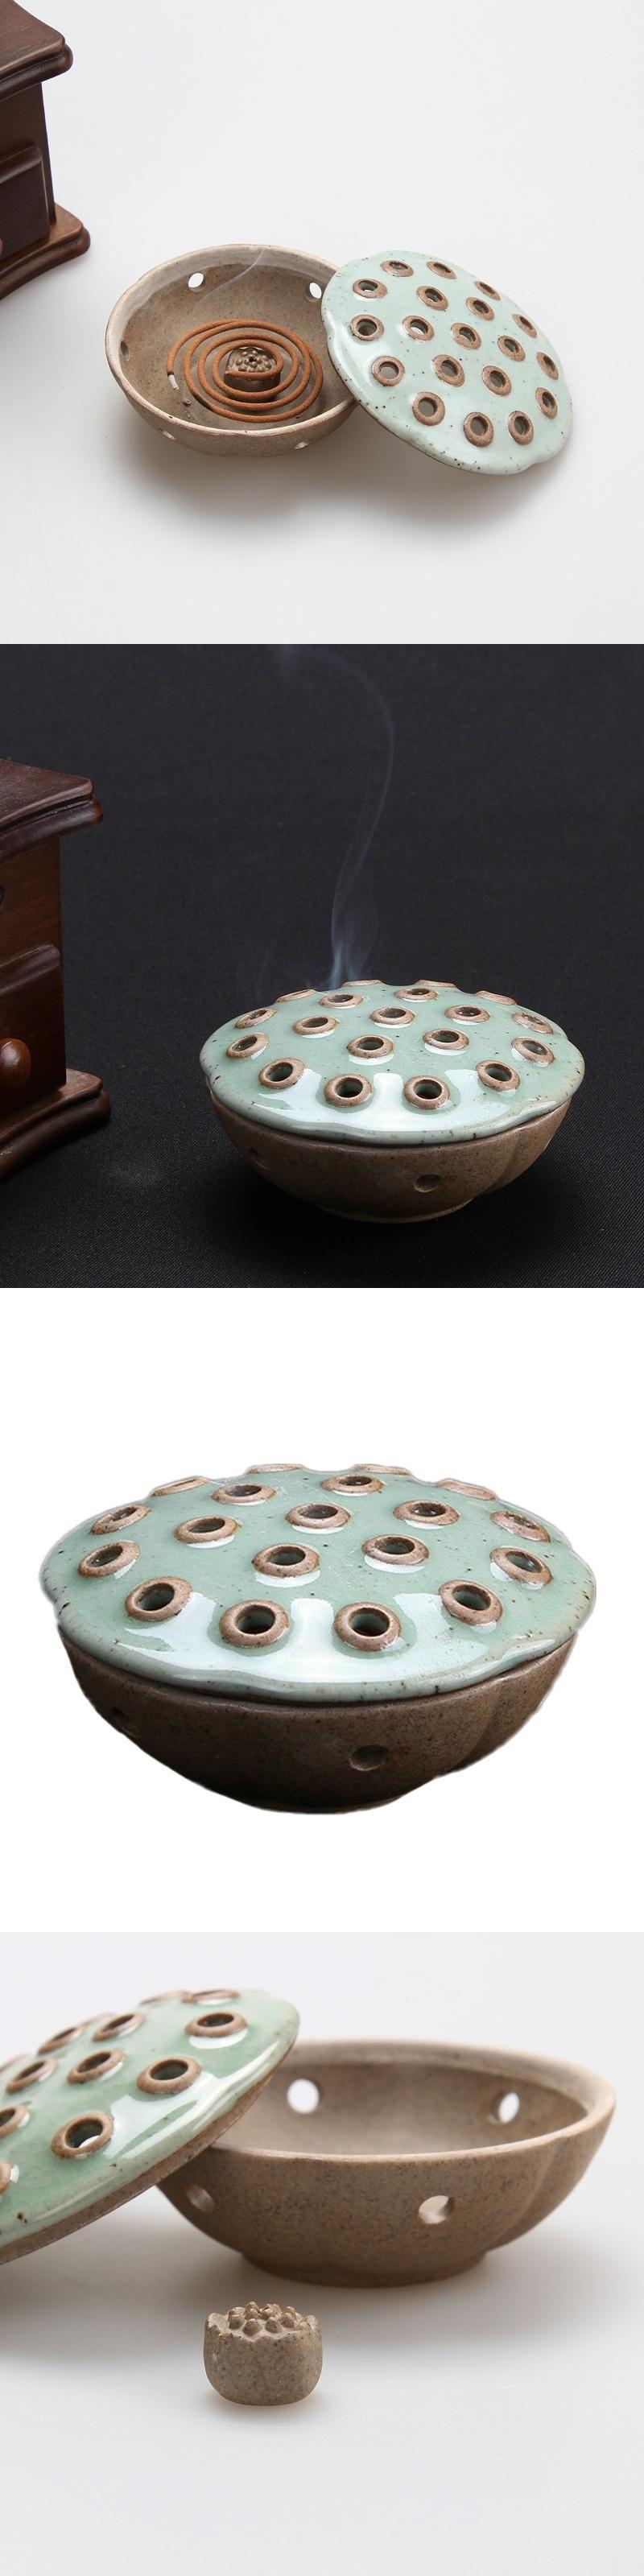 Ruyao Lotus Censer Ceramic Incensory Home Furnishing Decoration Lotus Aroma  Burner Coil Incense Burner Q